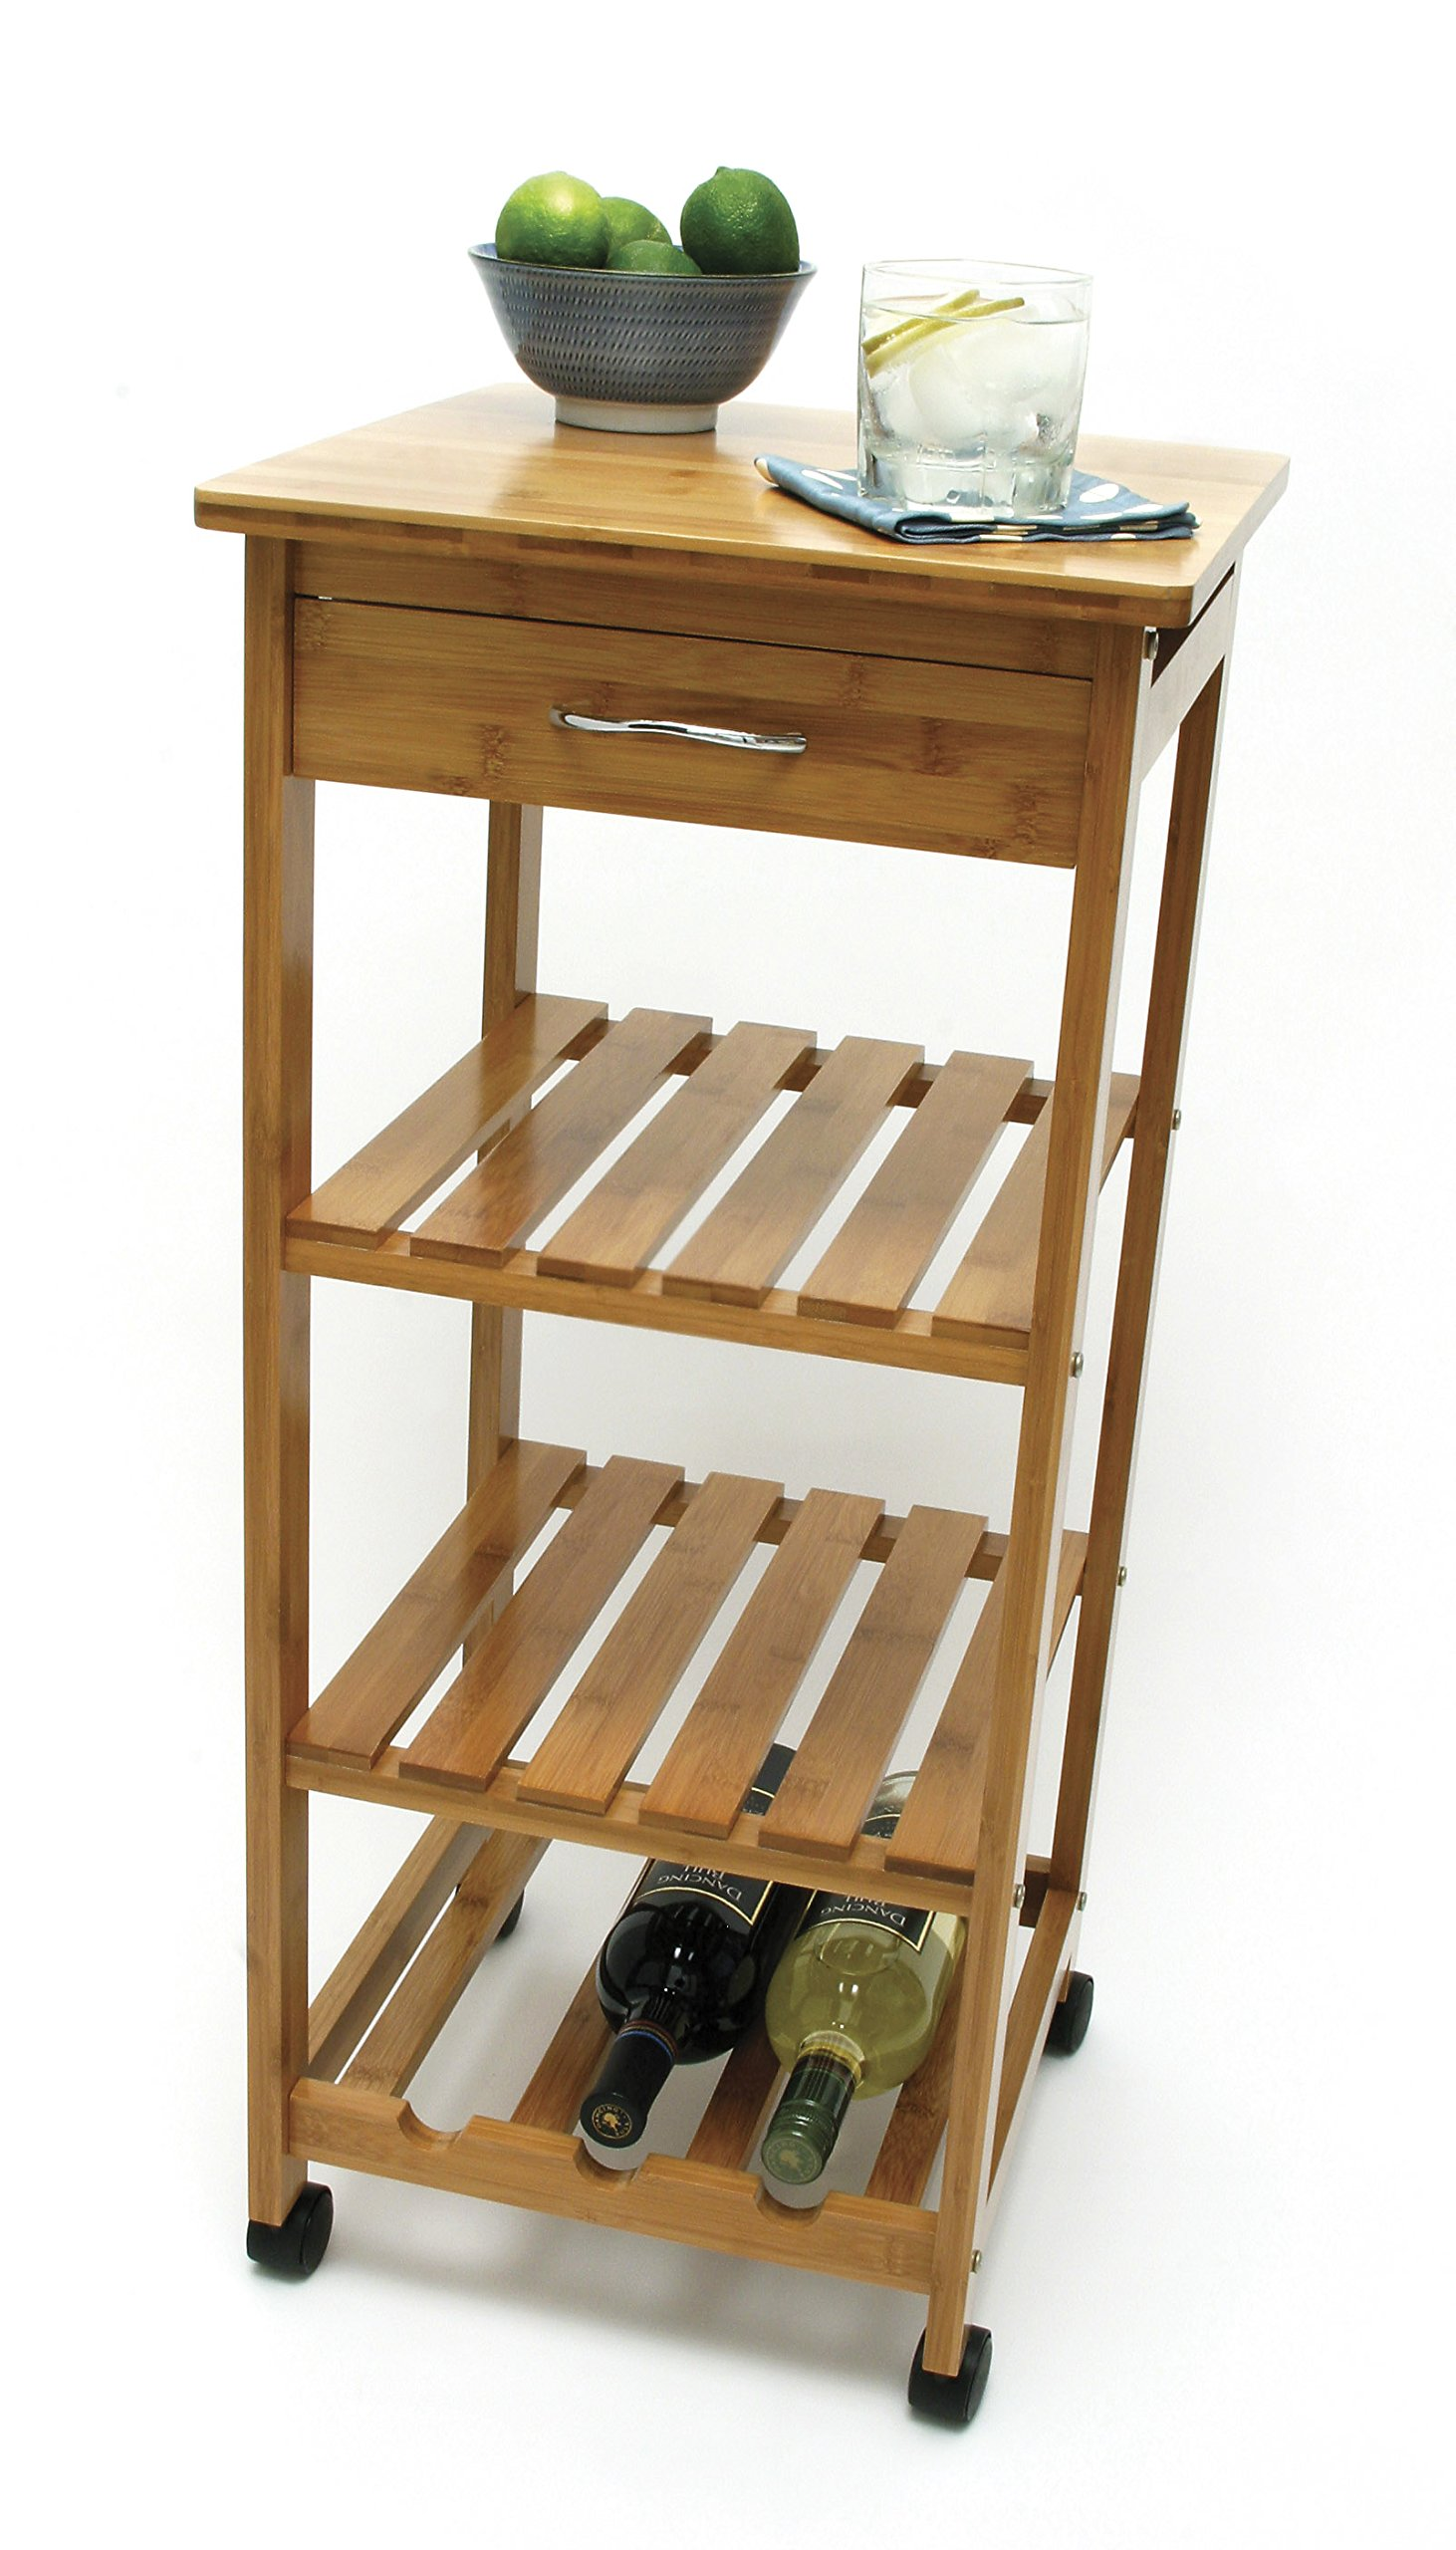 Lipper International 8914 Bamboo Wood Space-Saving Cart with 1 Drawer, 14.5'' x 14.5'' x 33.5'' by Lipper International (Image #2)